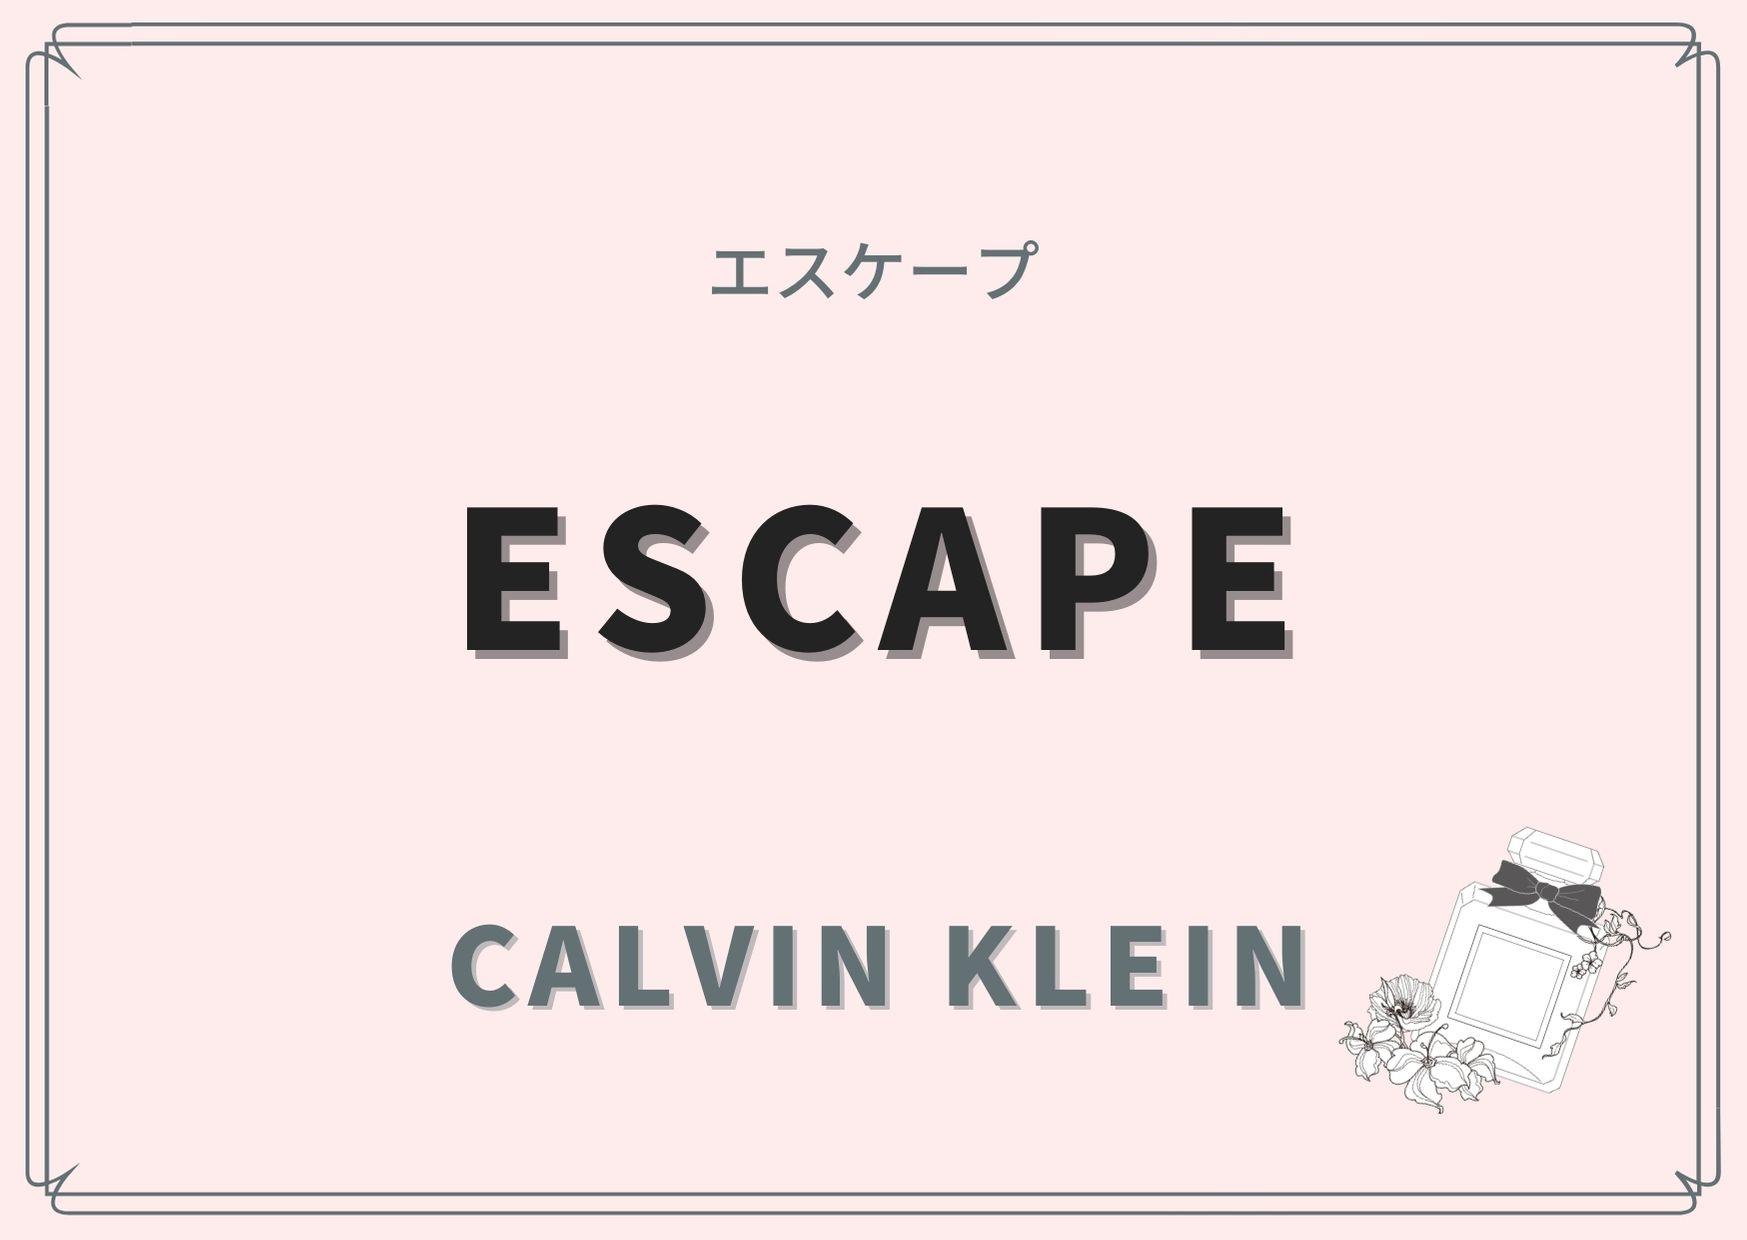 ESCAPE(エスケープ)/Calvin Klein(カルバン クライン)